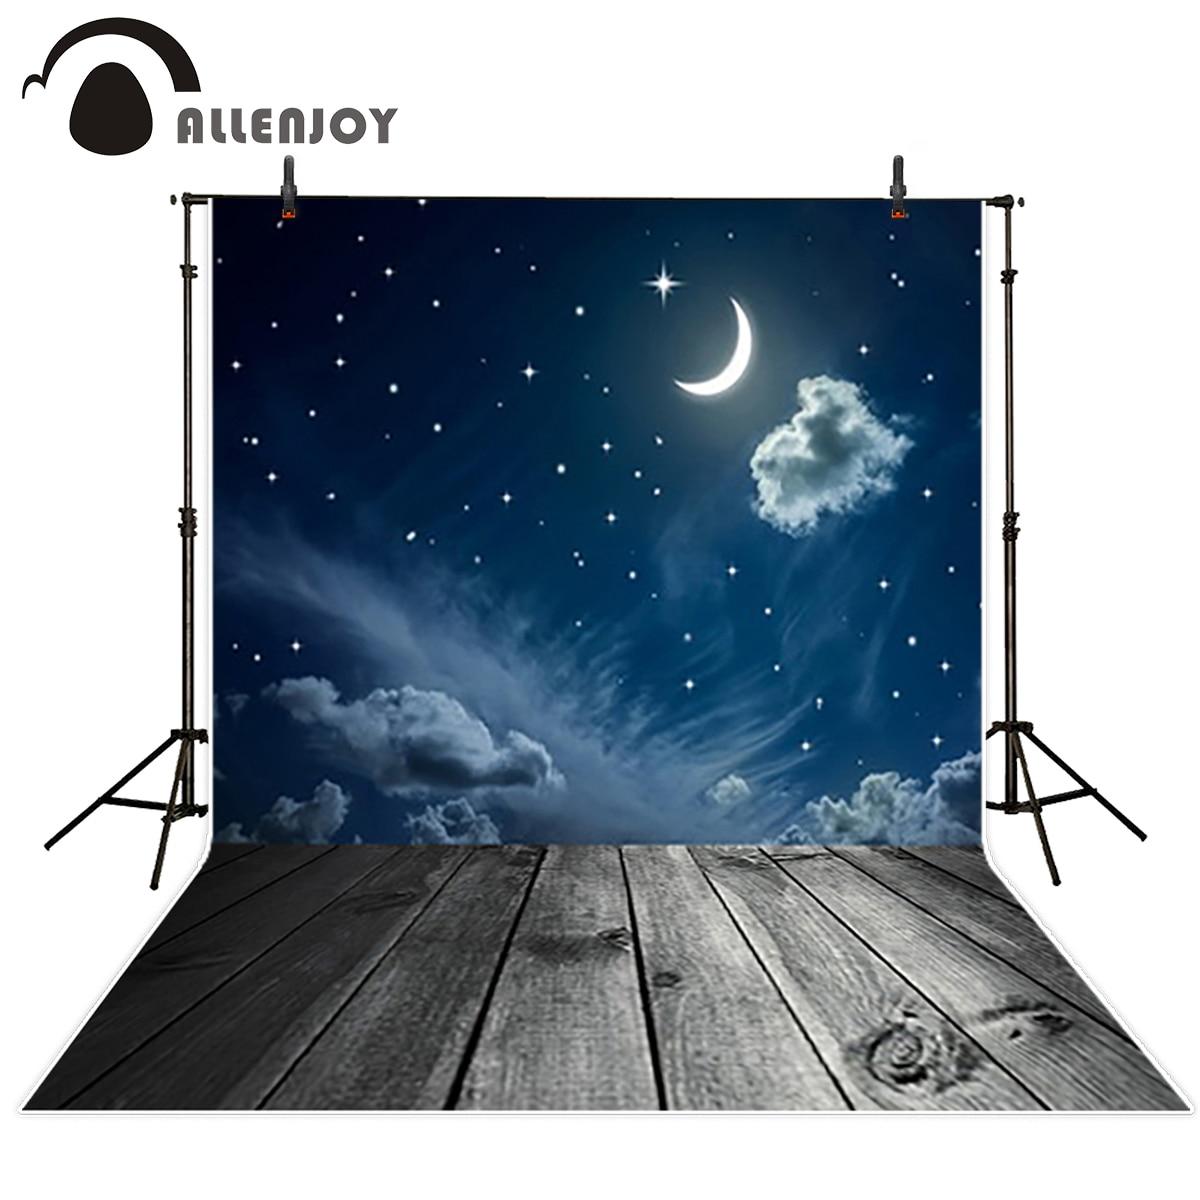 Allenjoy vinyl backdrops for personal taking photos Blue sky moon cloud wooden floor for photo vinyl photographic background blue sky чаша северный олень